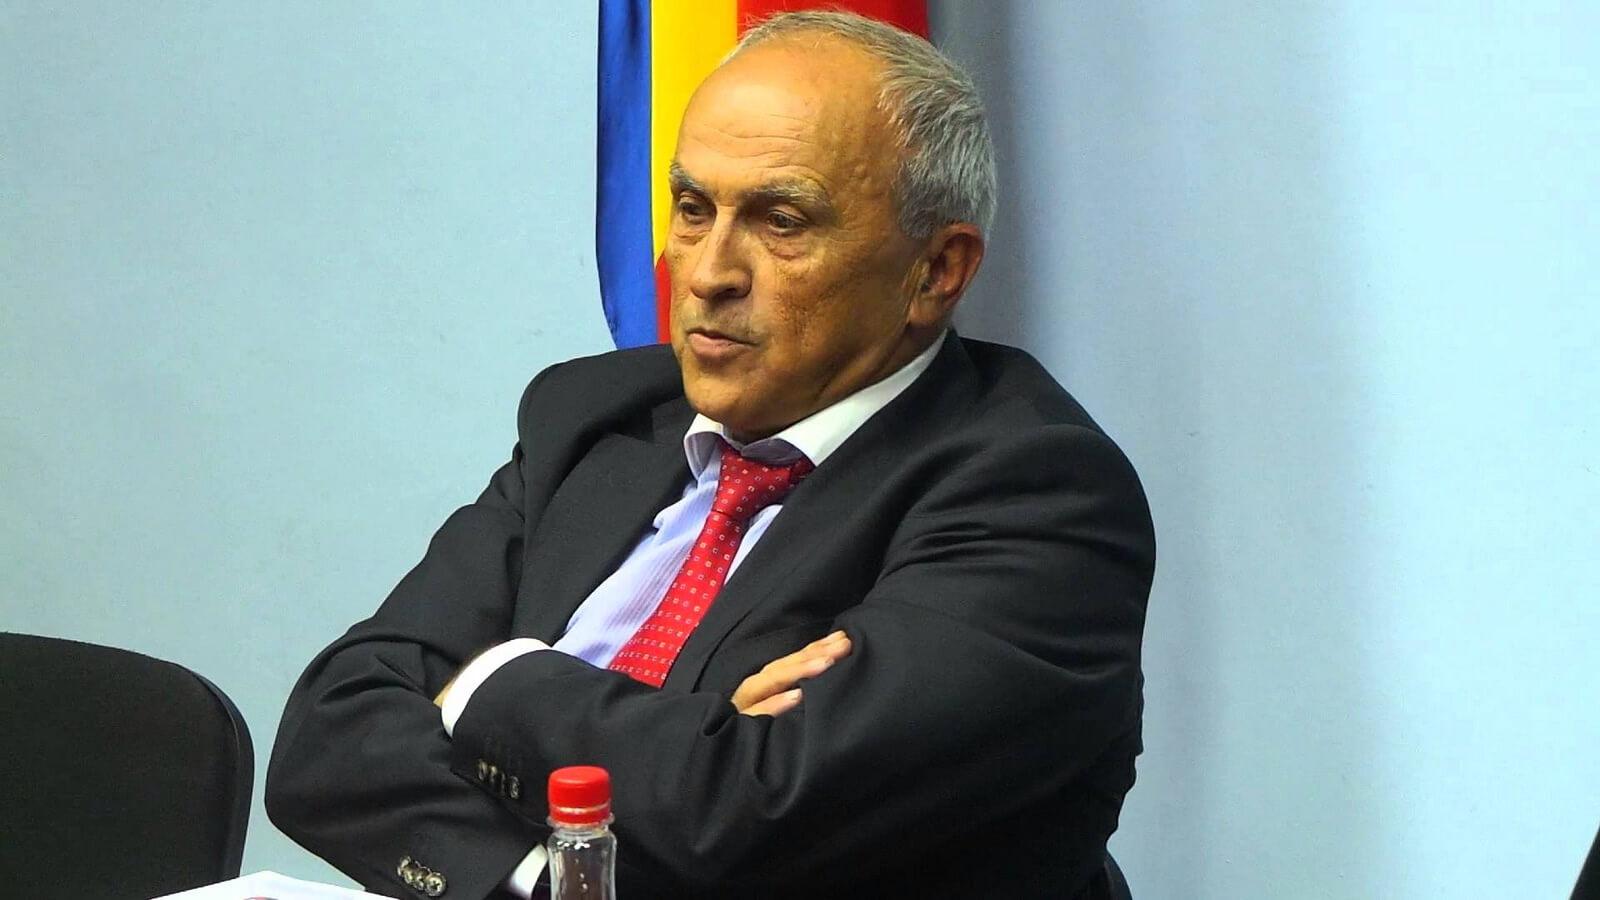 Mircea Cosma